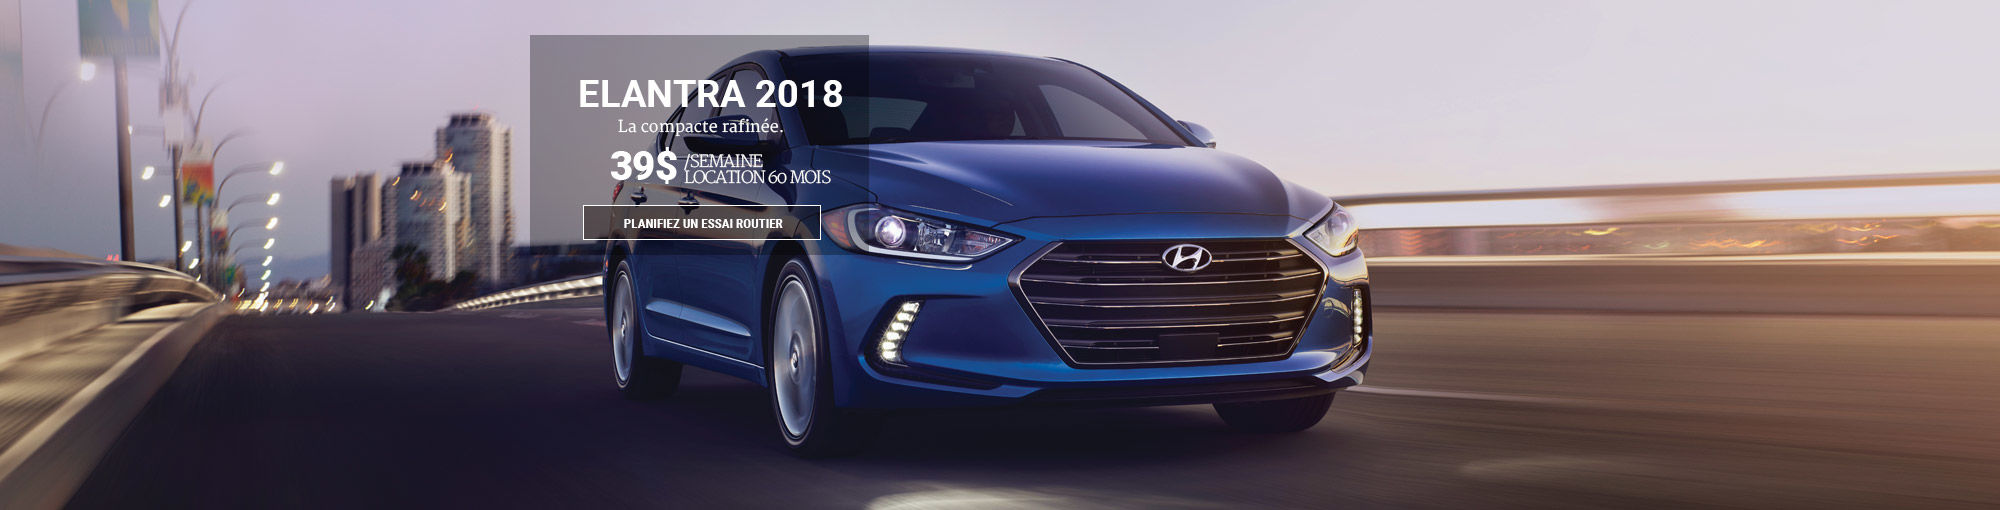 Hyundai elantra header 2018-  septembre